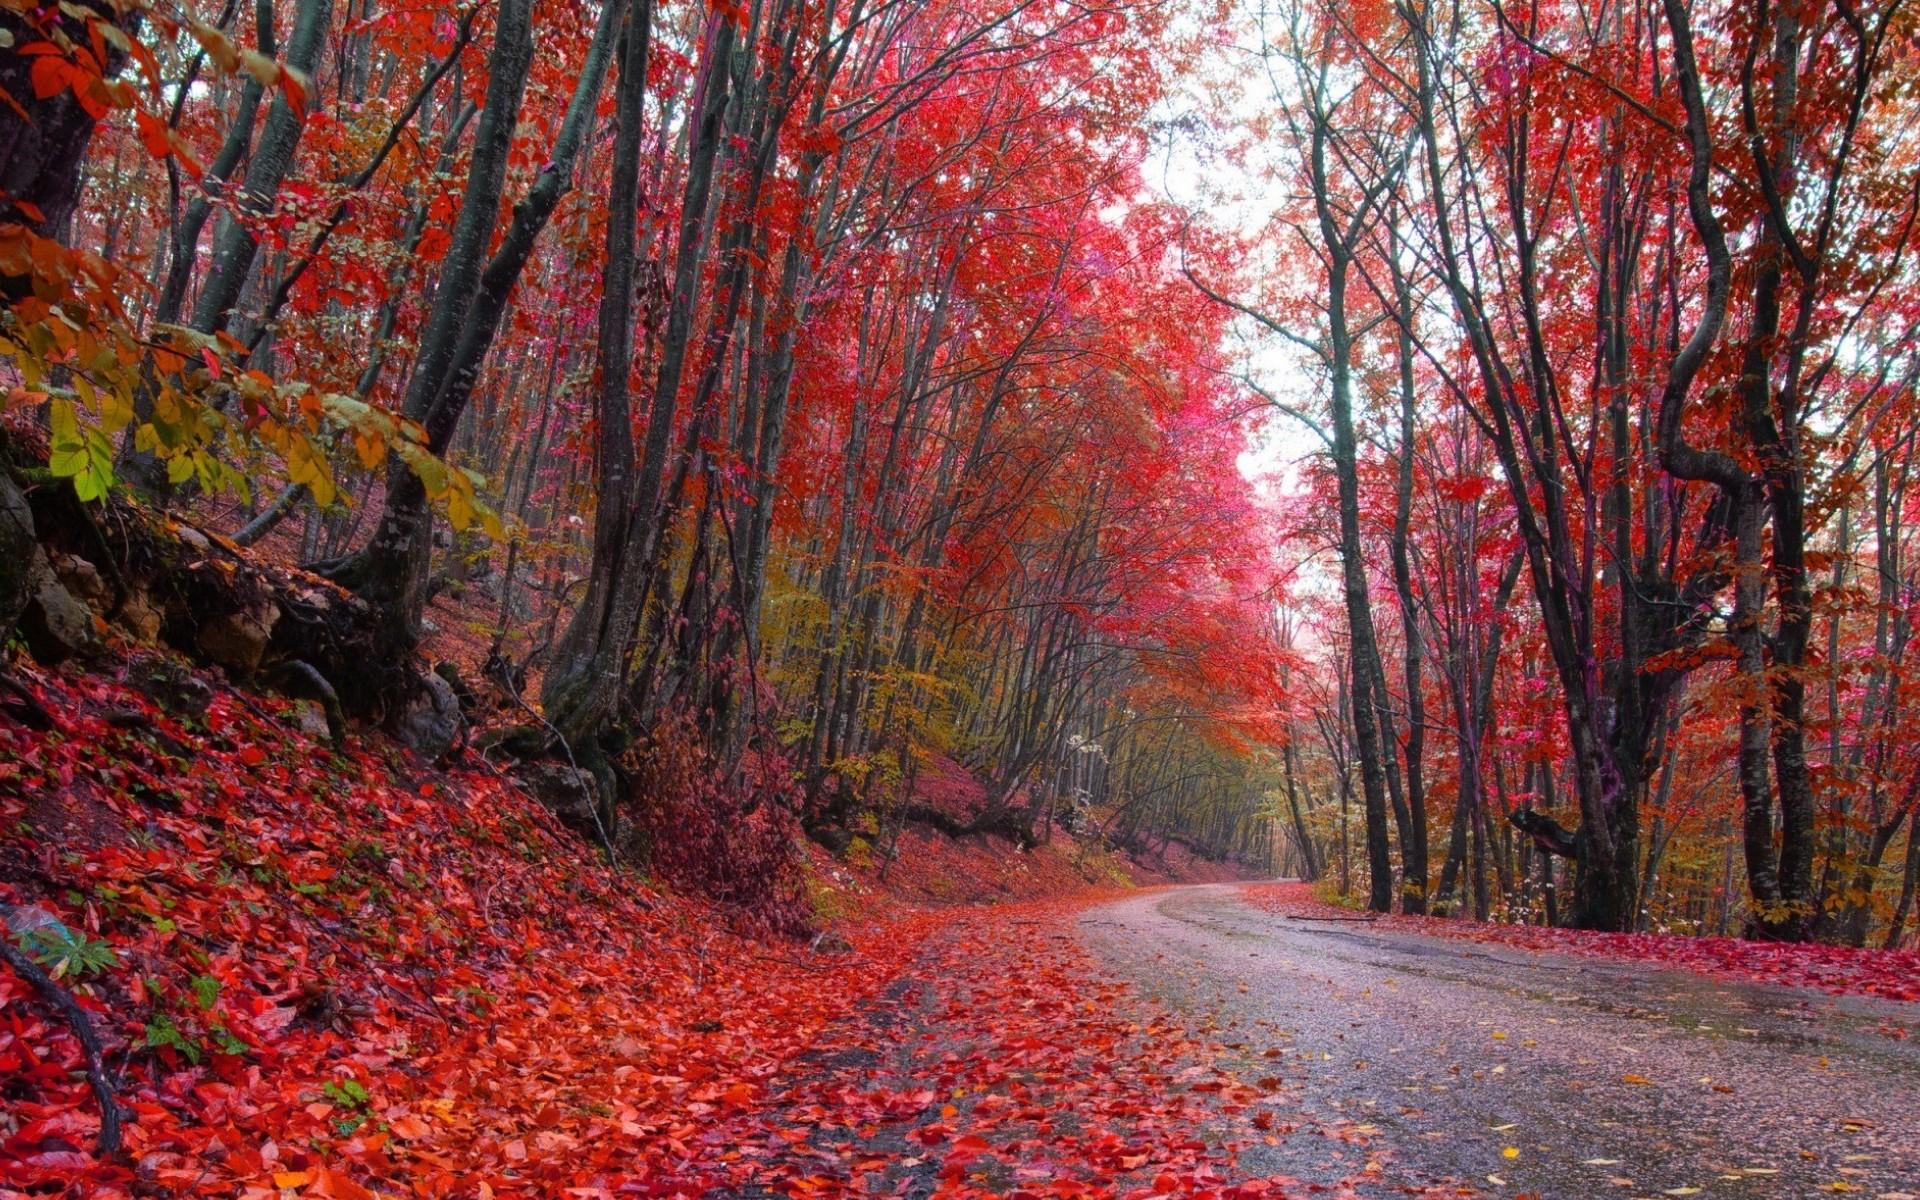 Road Leaf Tree Fall 1920x1200